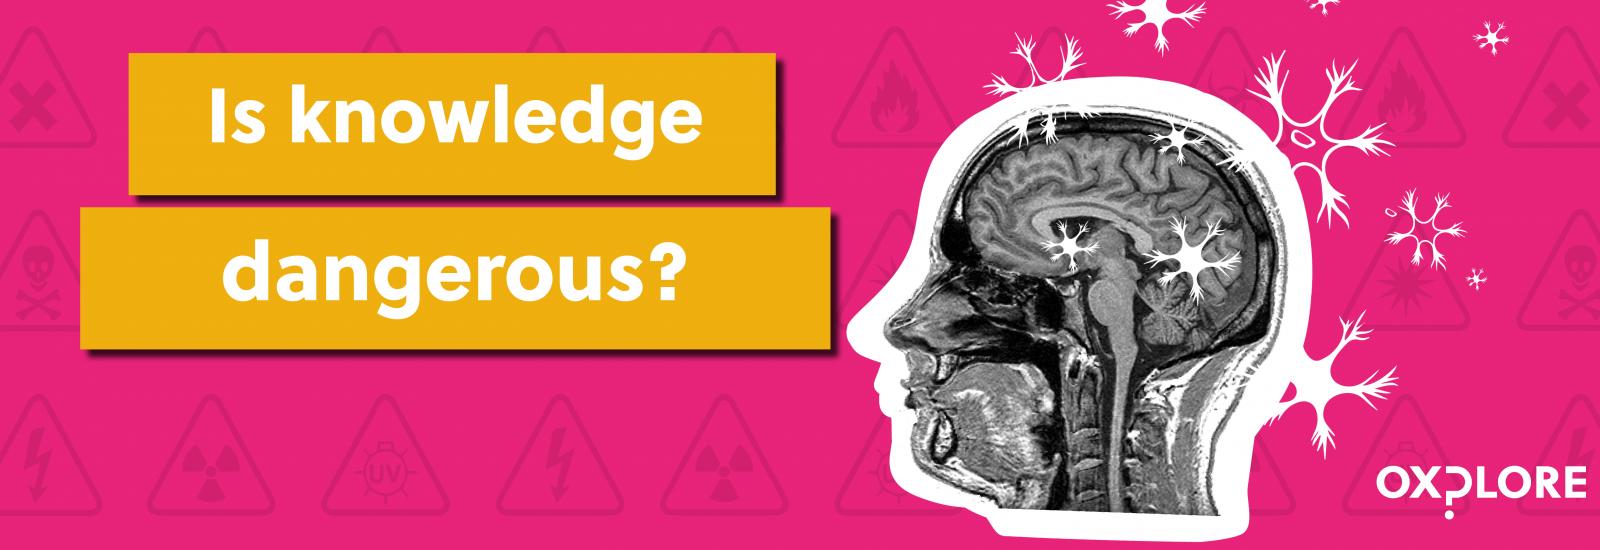 Is knowledge dangerous